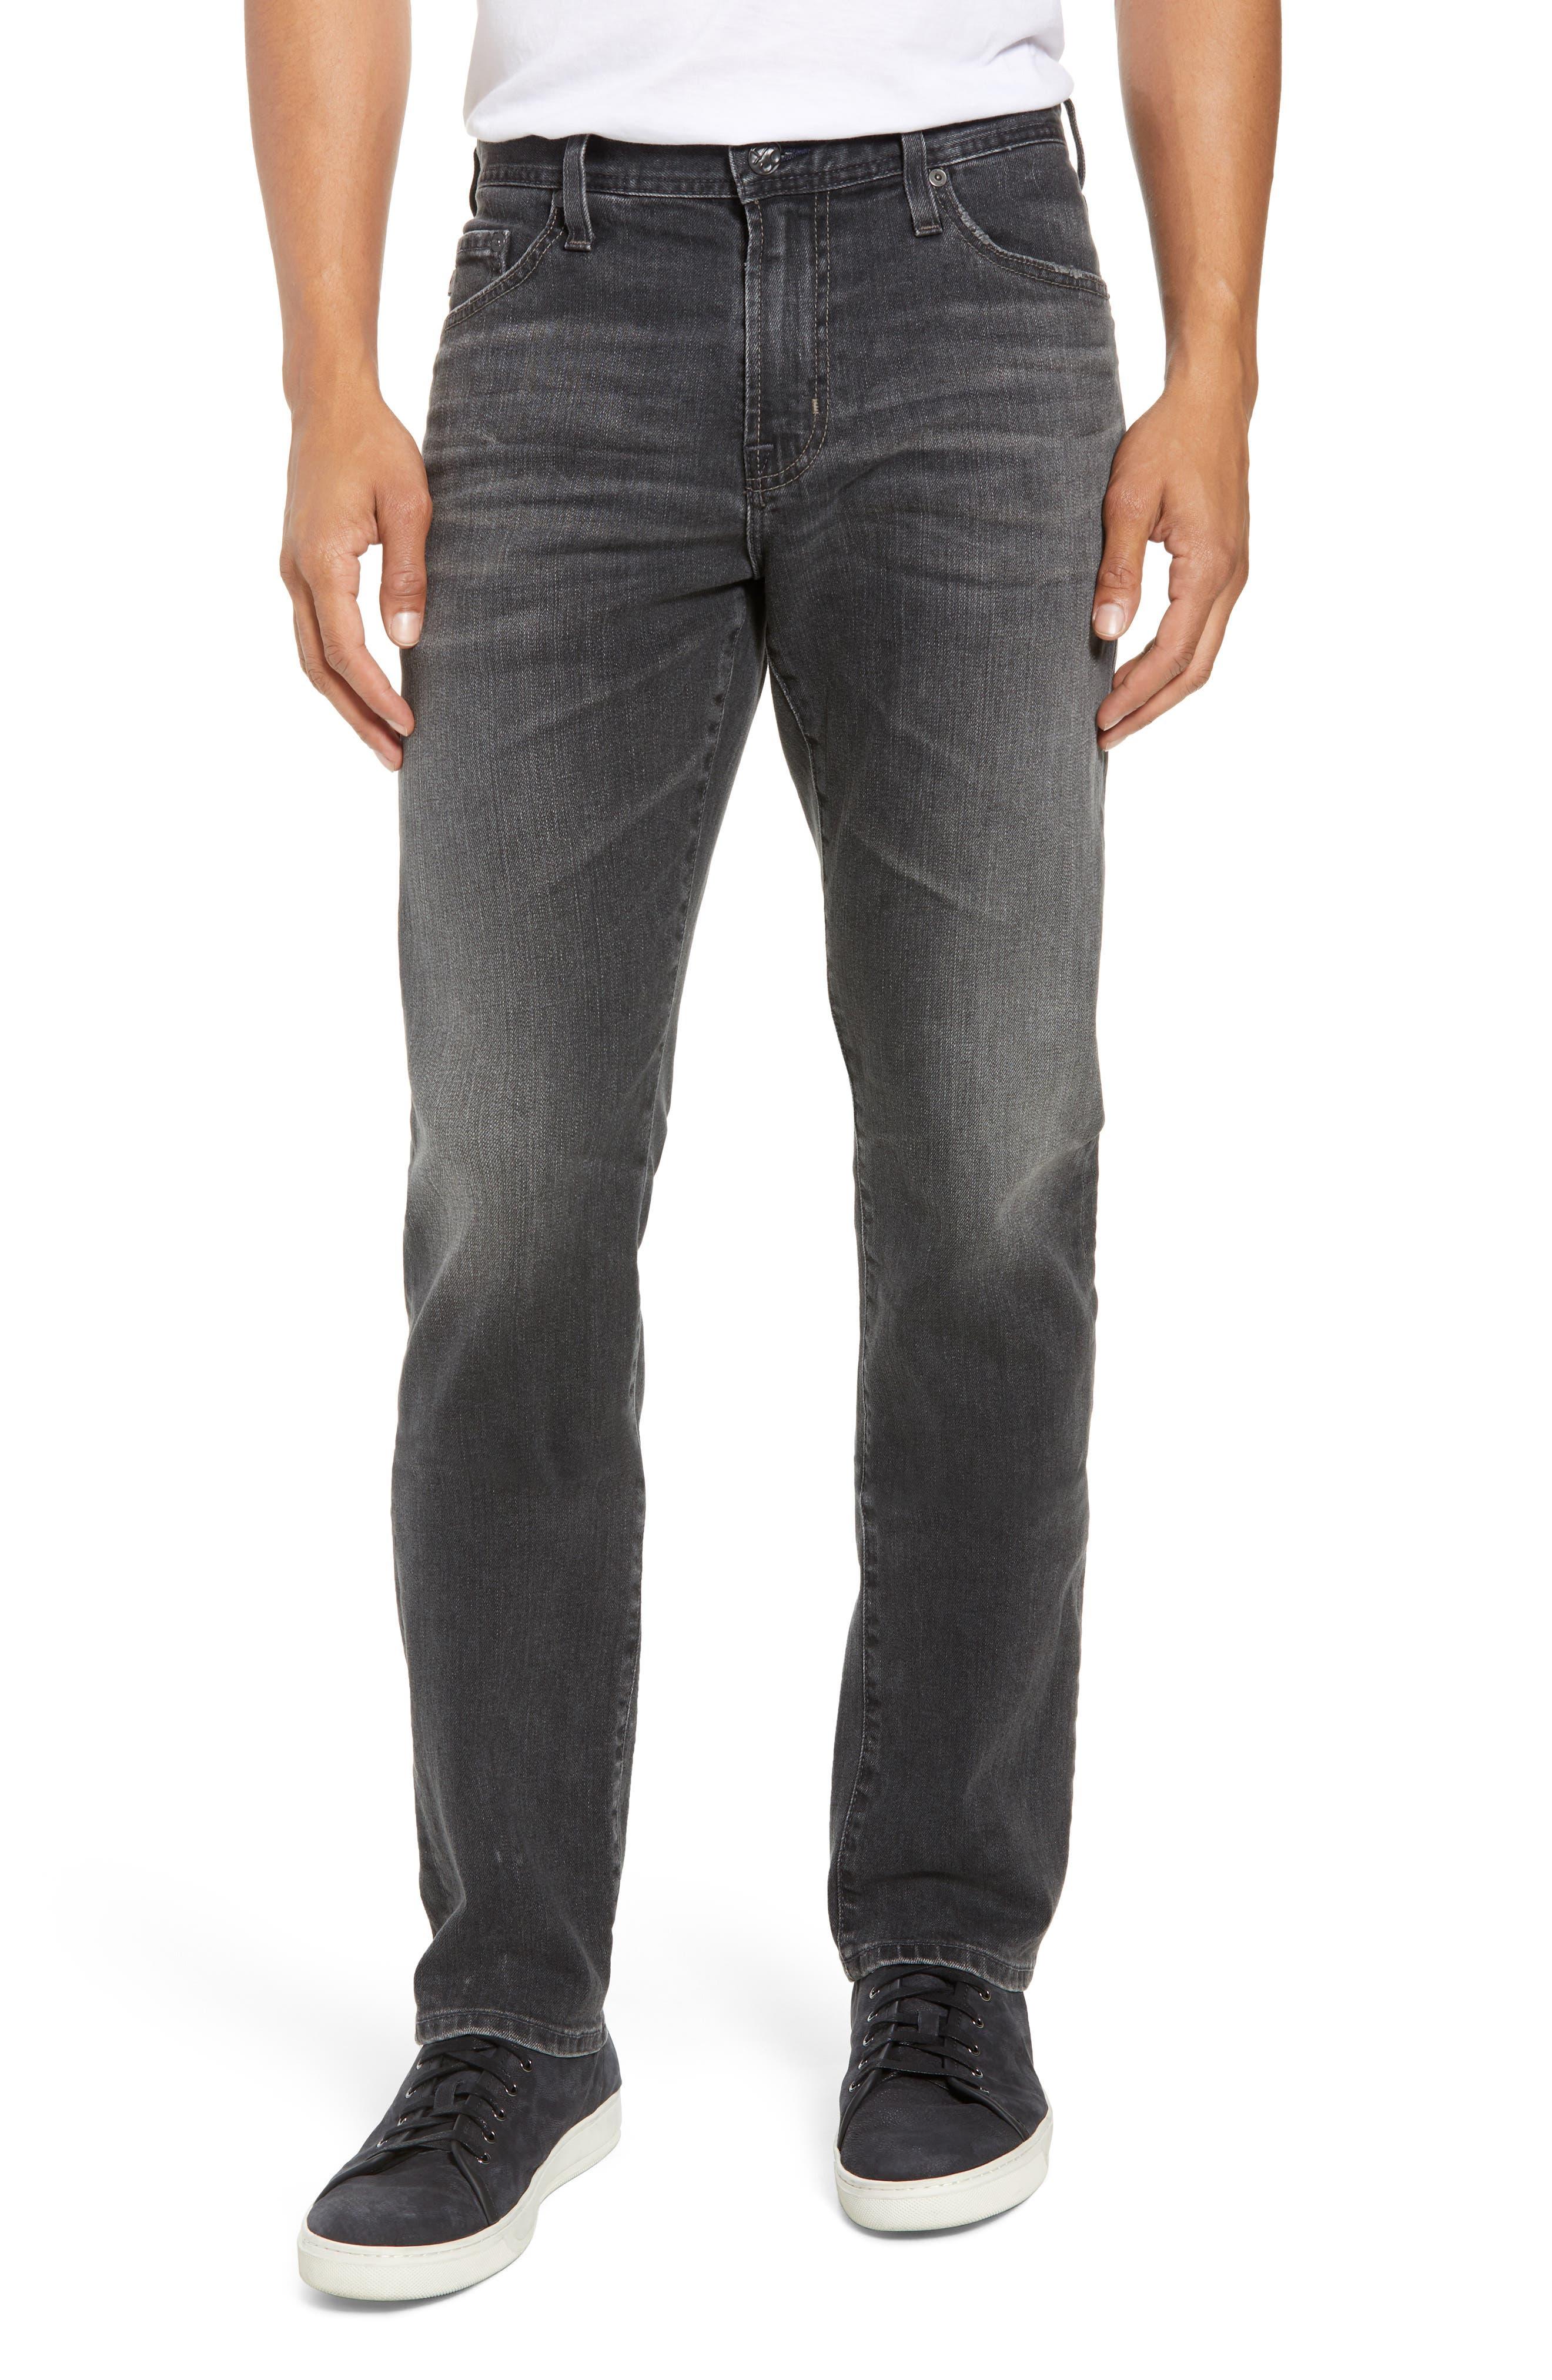 Everett Slim Straight Leg Jeans,                             Main thumbnail 1, color,                             6 YEARS ARCADE